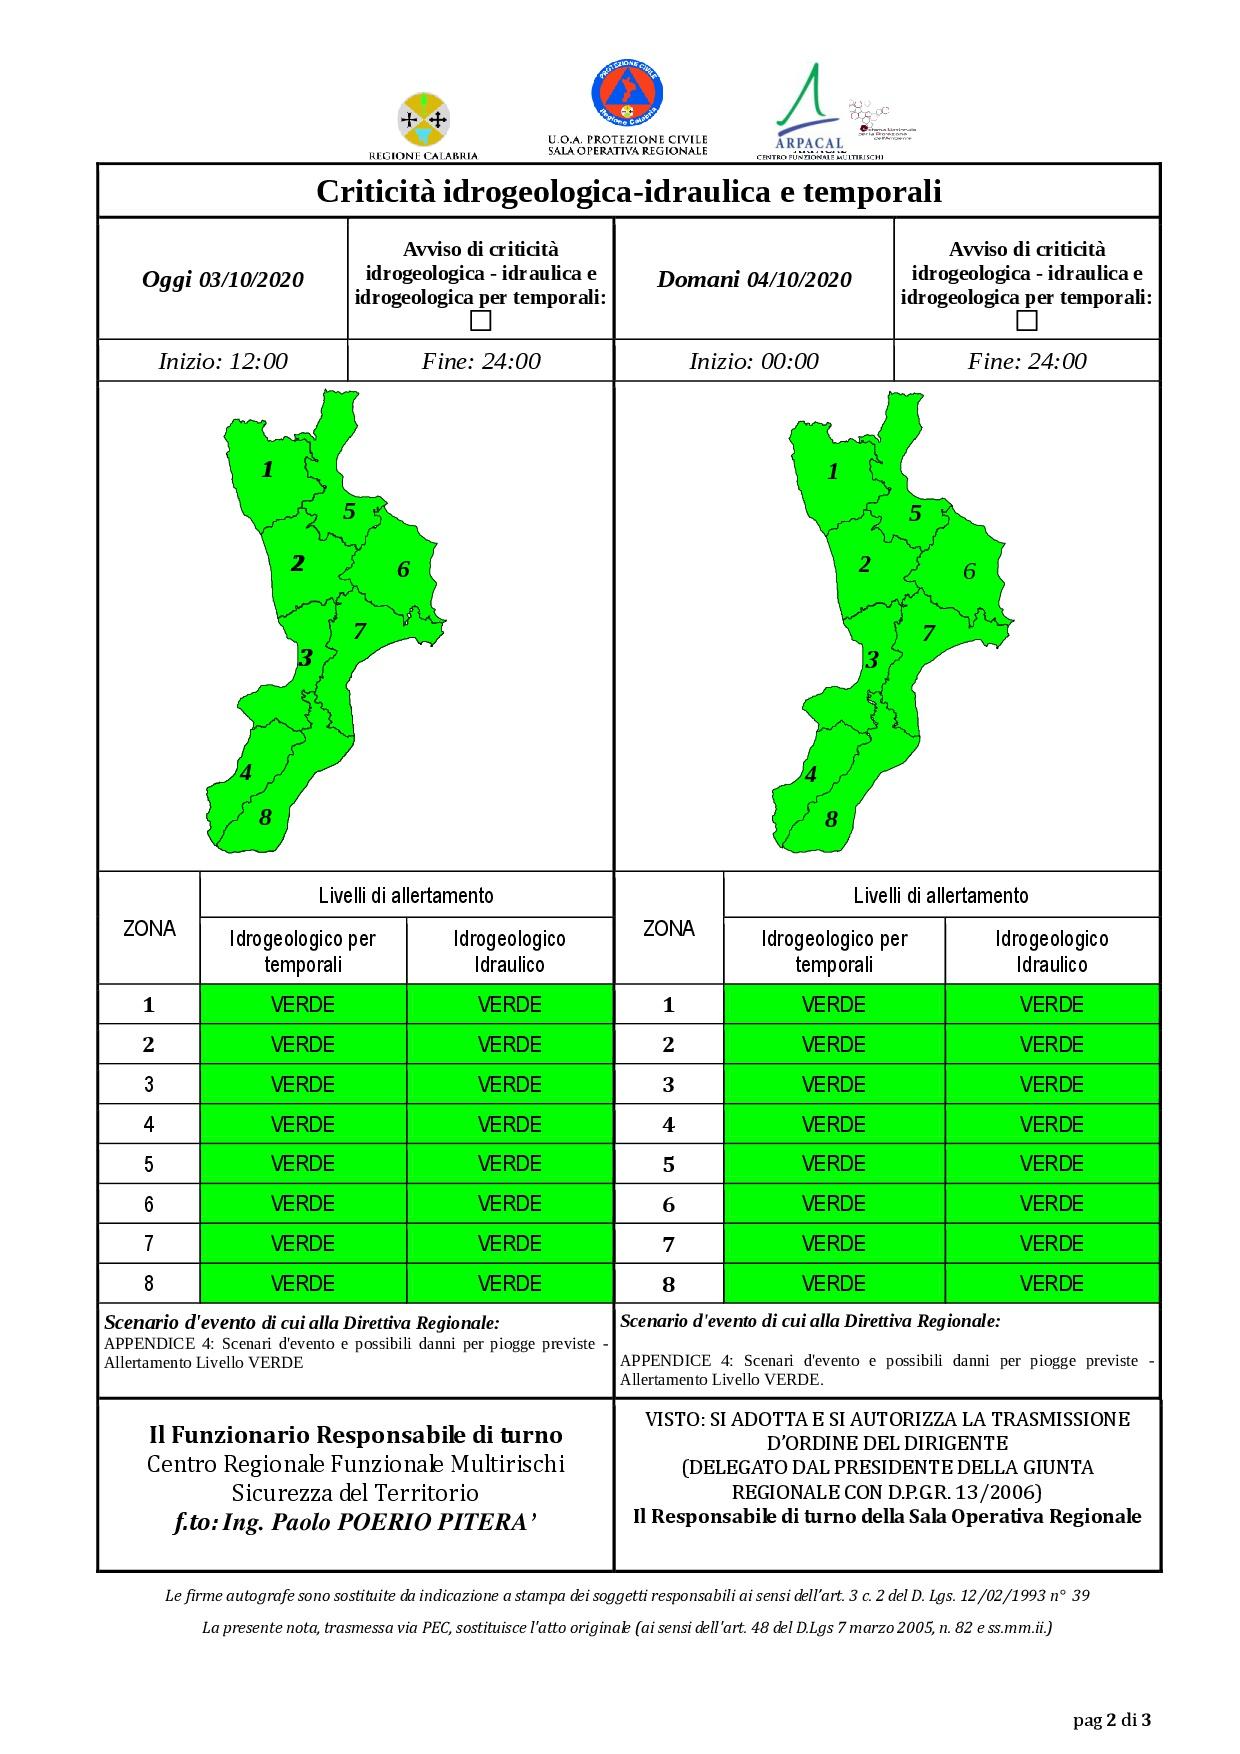 Criticità idrogeologica-idraulica e temporali in Calabria 03-10-2020